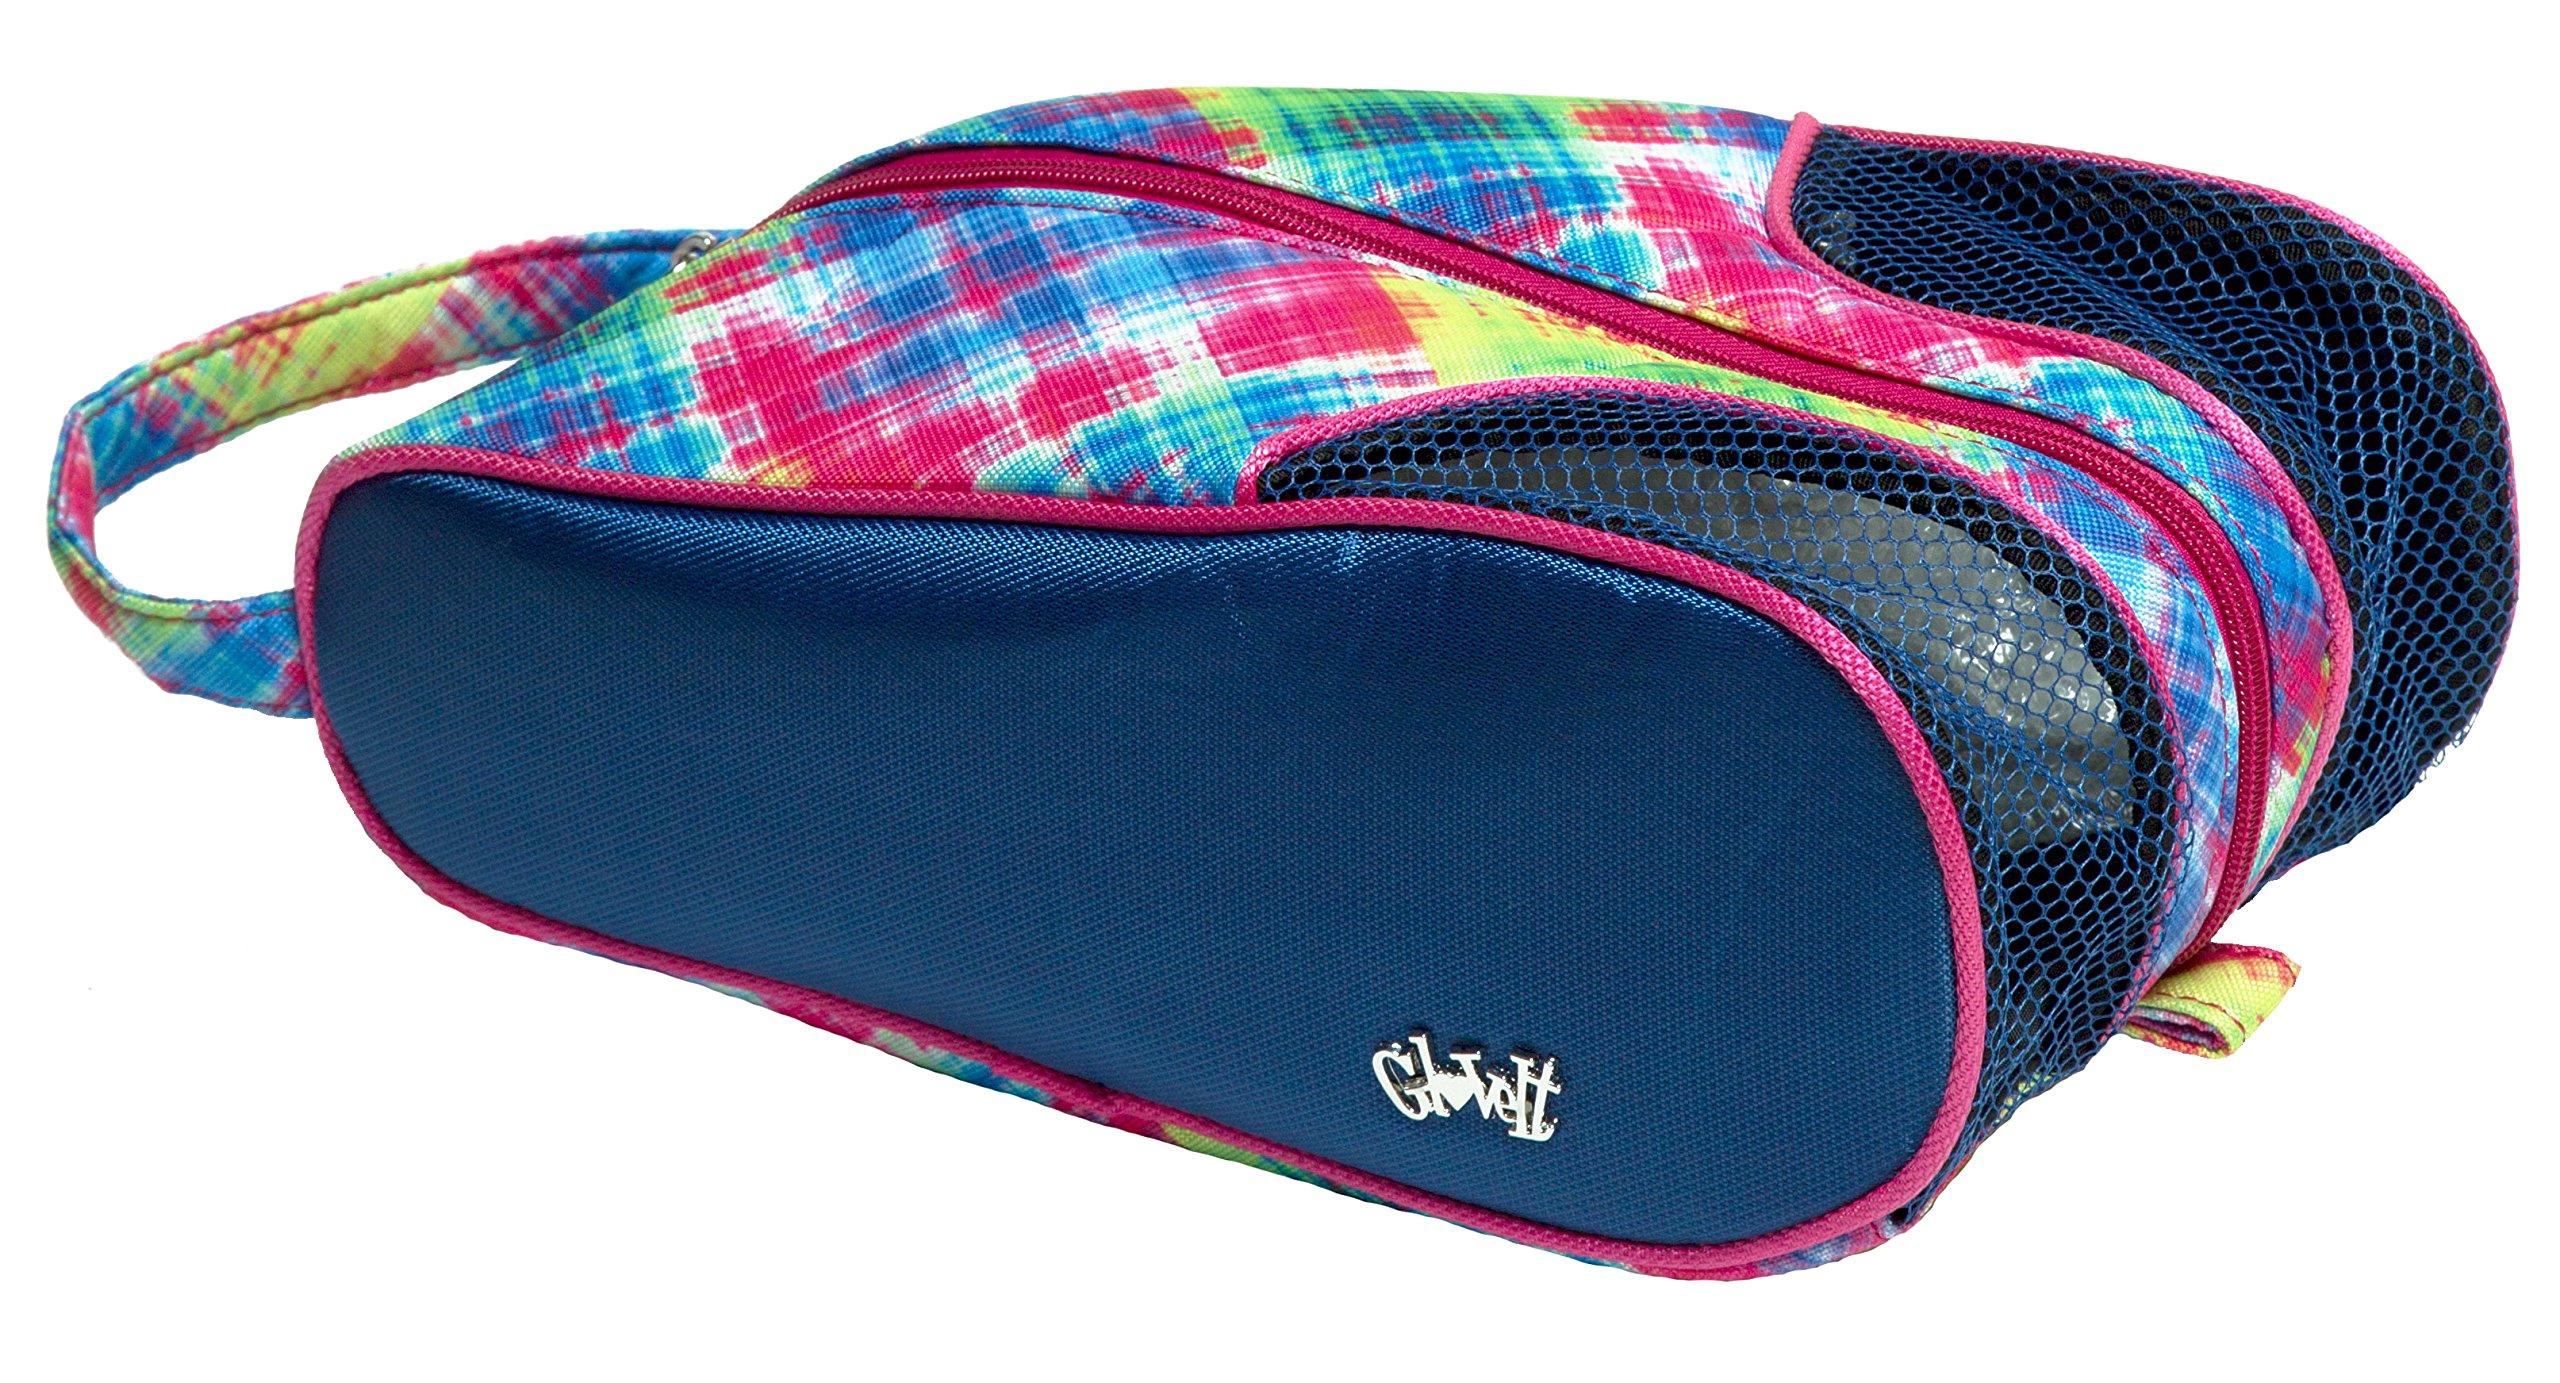 Glove It Women's Electirc Plaid Shoe Bag SB227